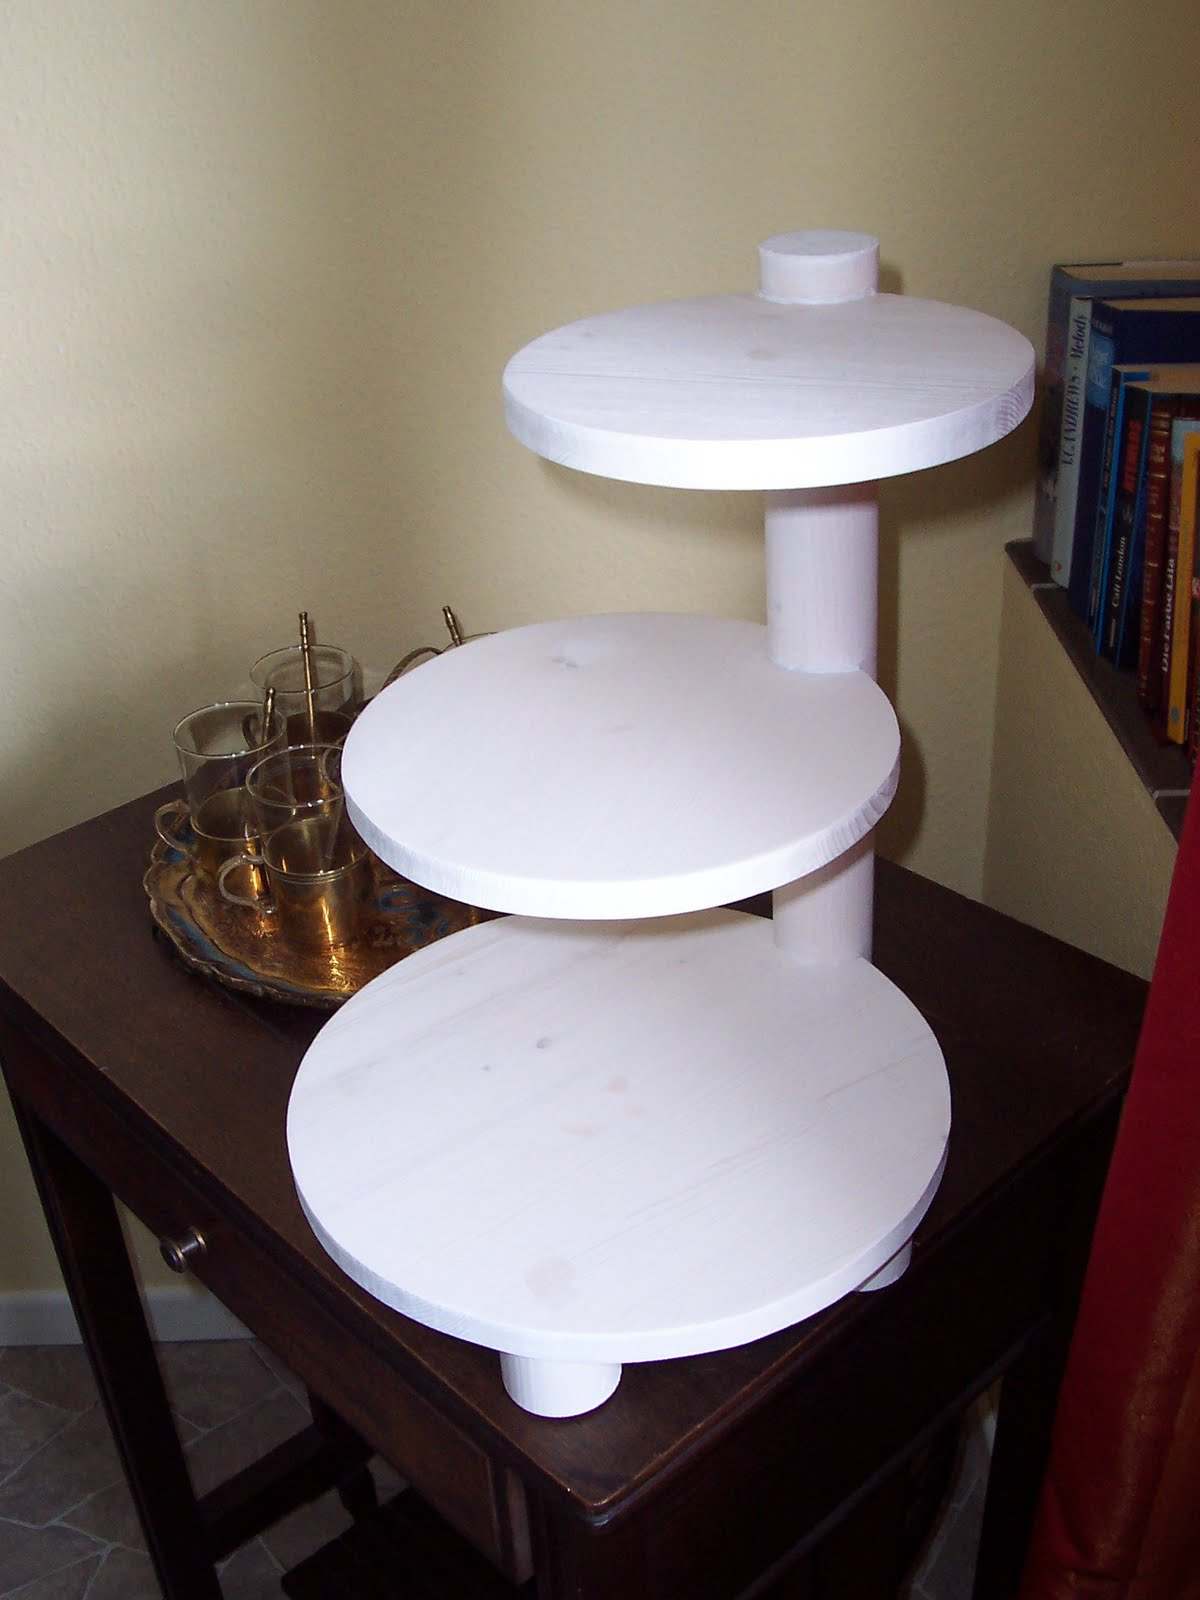 meine seifensch tze april 2011. Black Bedroom Furniture Sets. Home Design Ideas